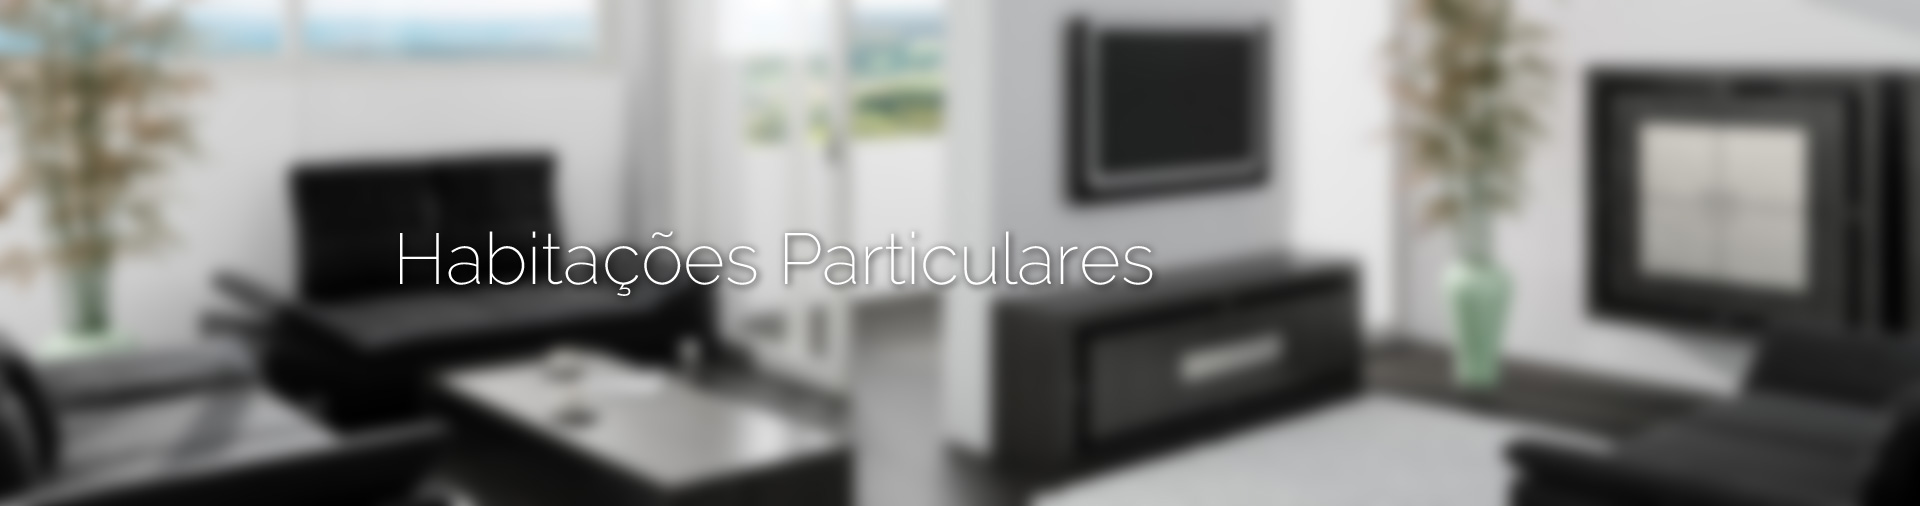 Habitações Particulares